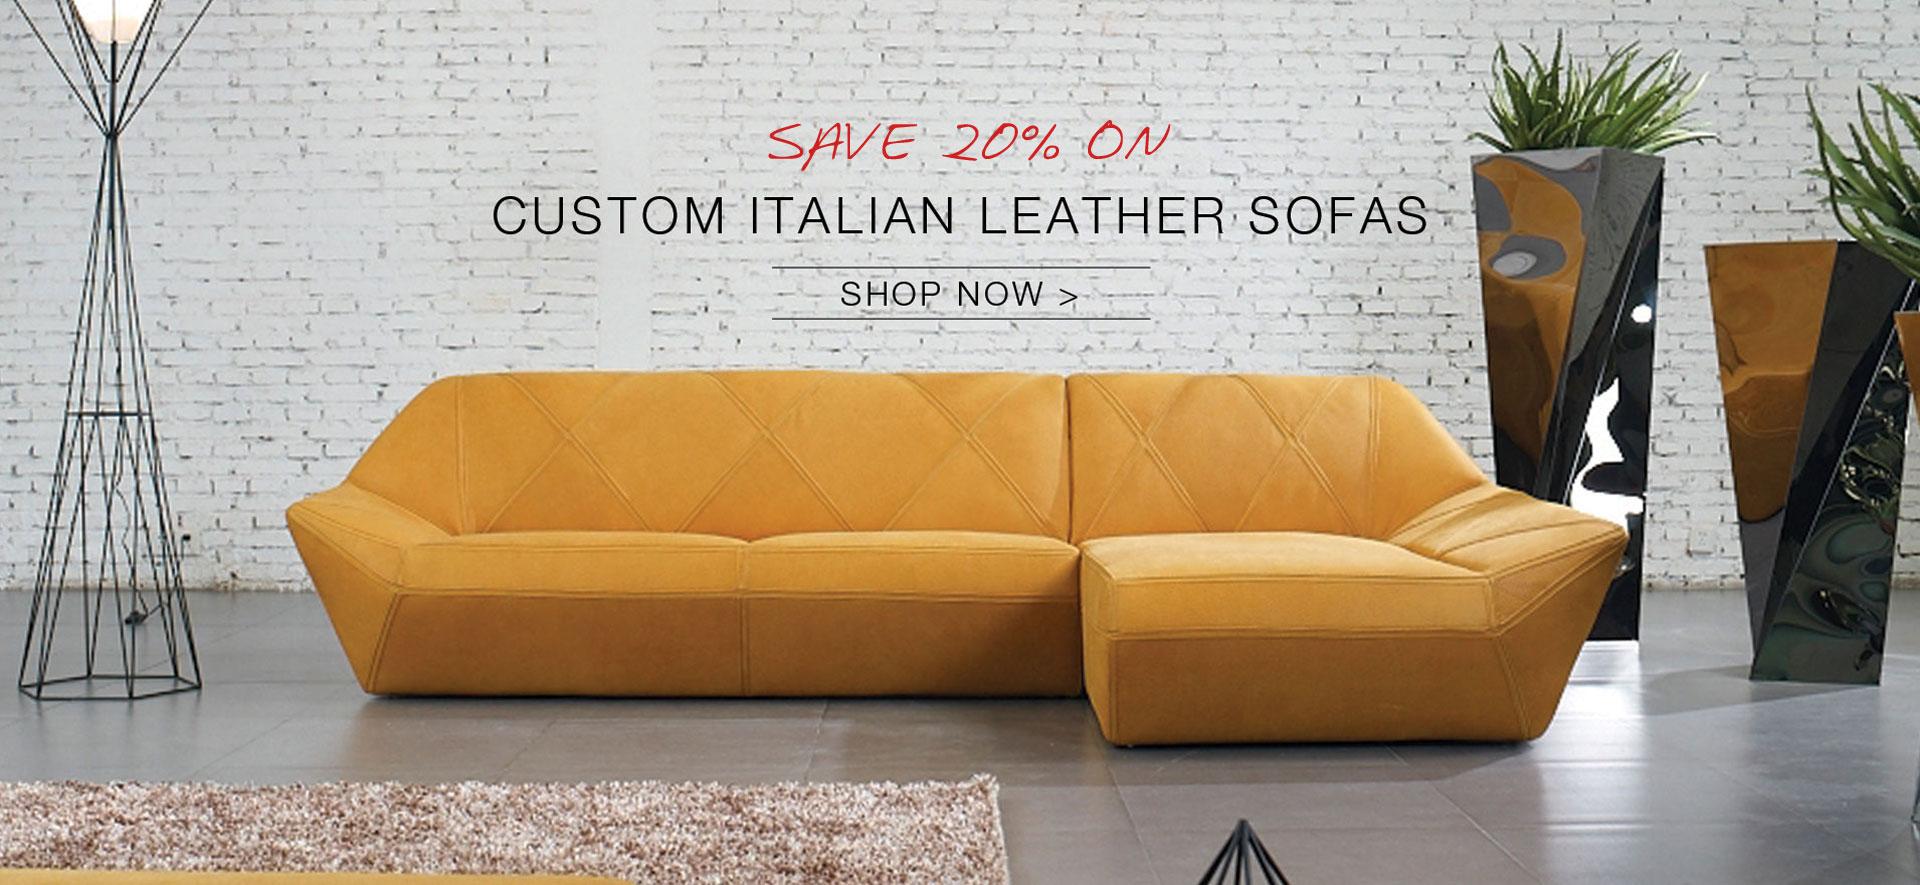 CUSTOM-LEATHER-SOFAS-SAVE-20